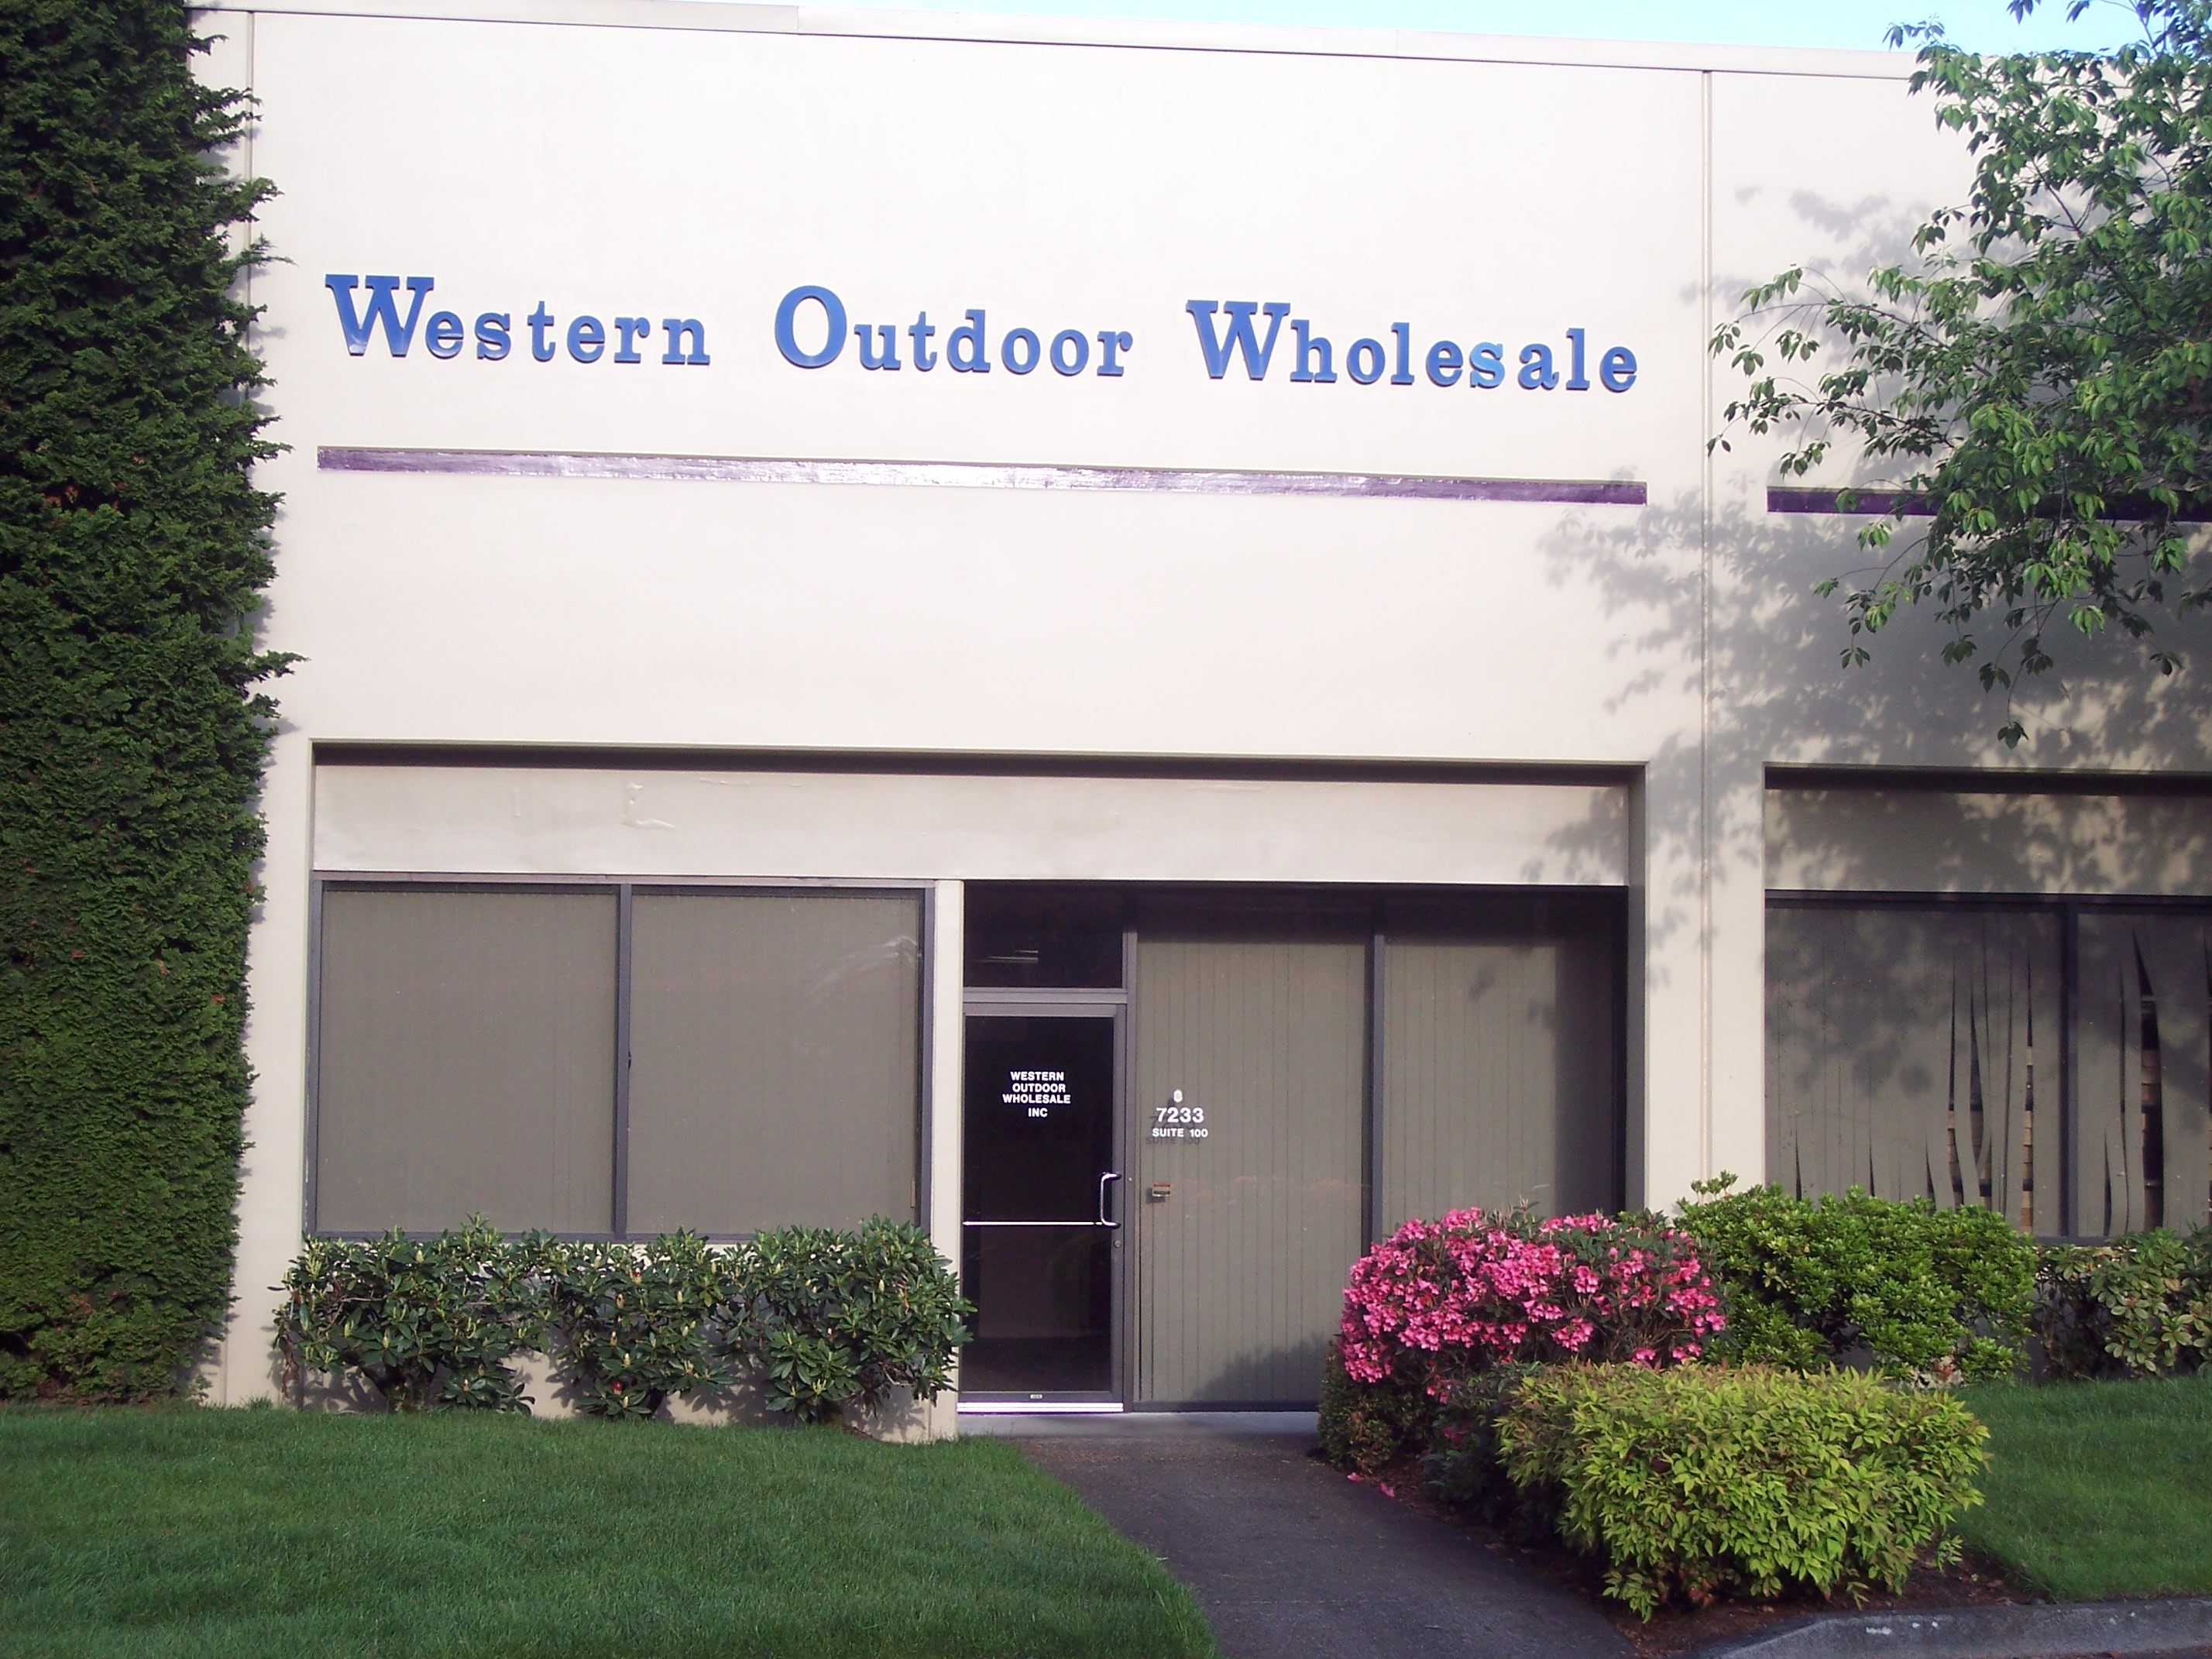 Western Outdoor Wholesale